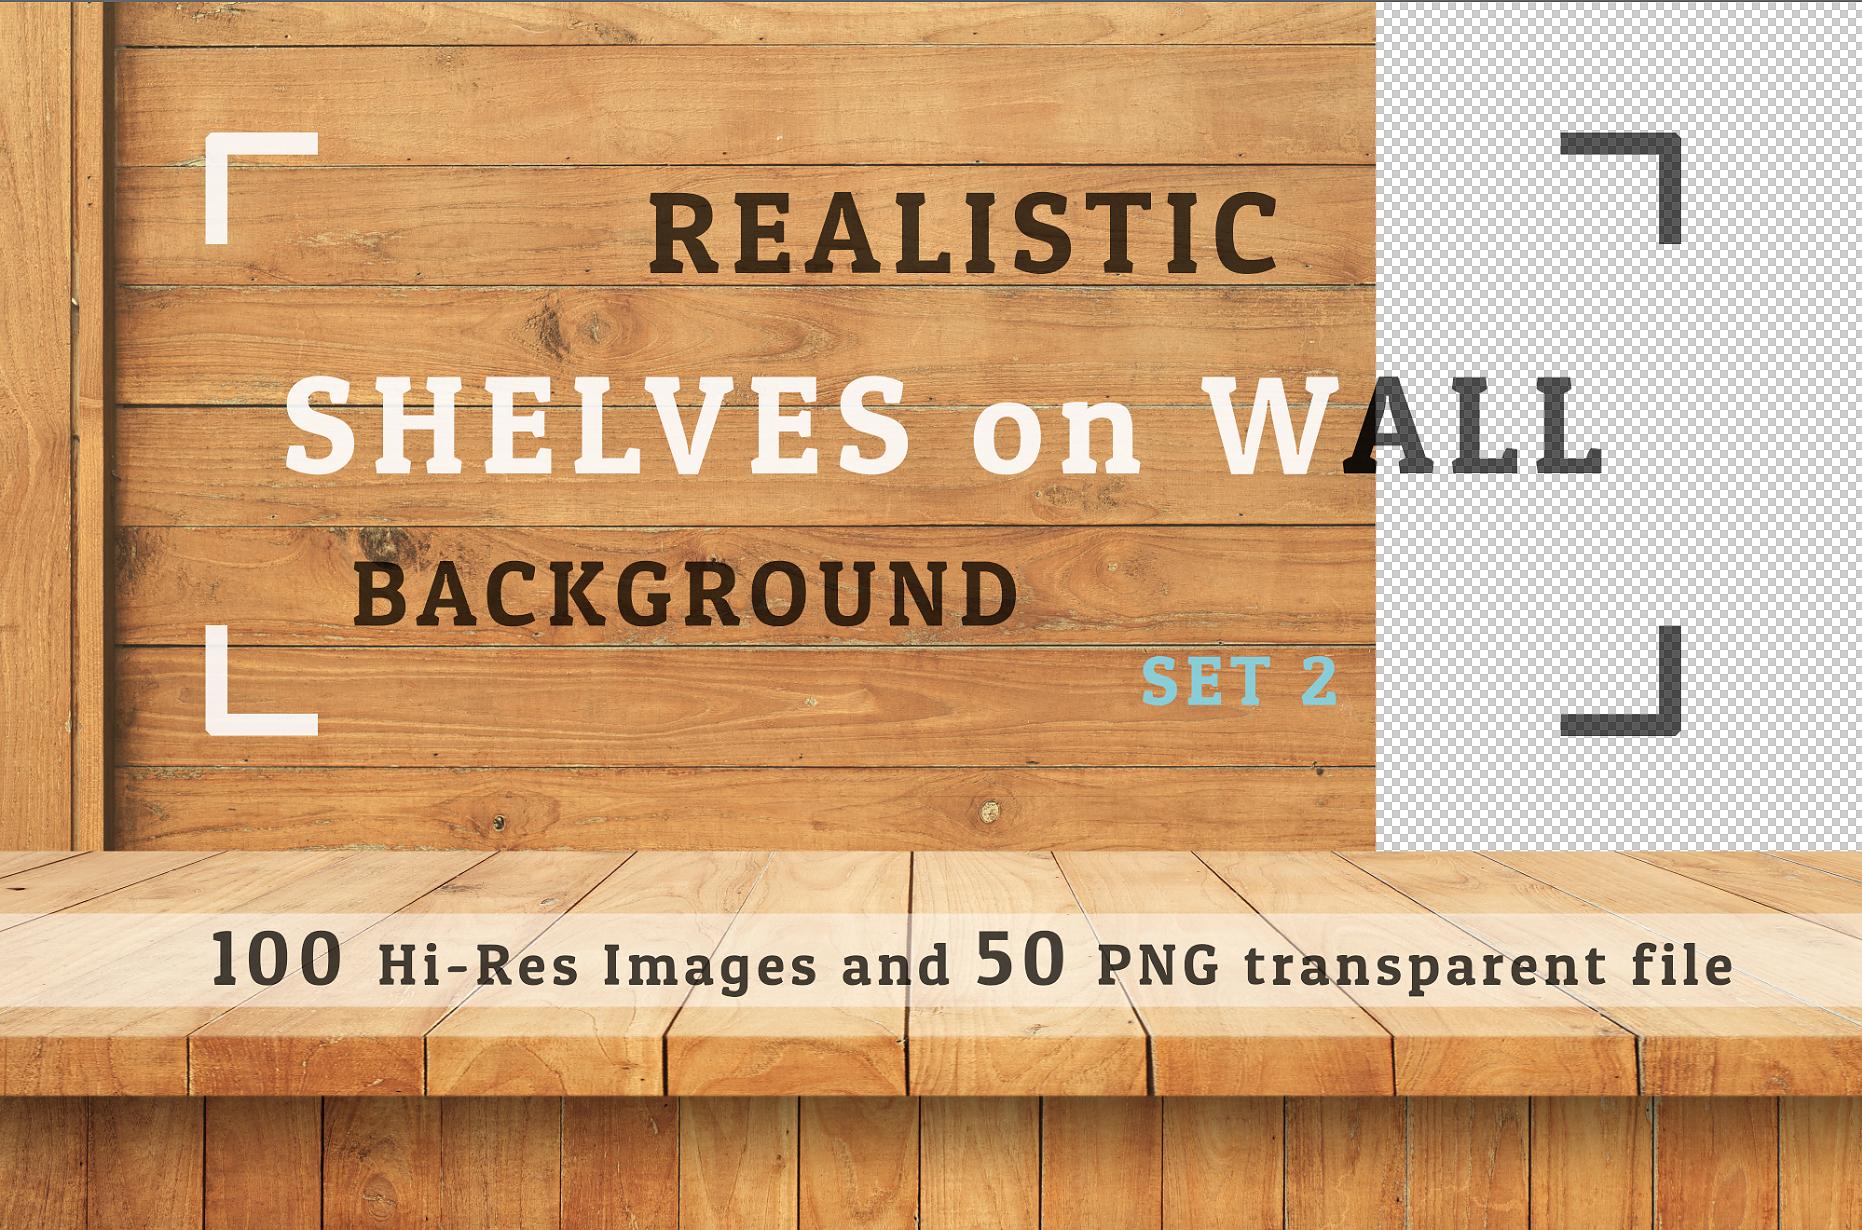 100 Realistic Shelves on Wall. Set 2 example image 1